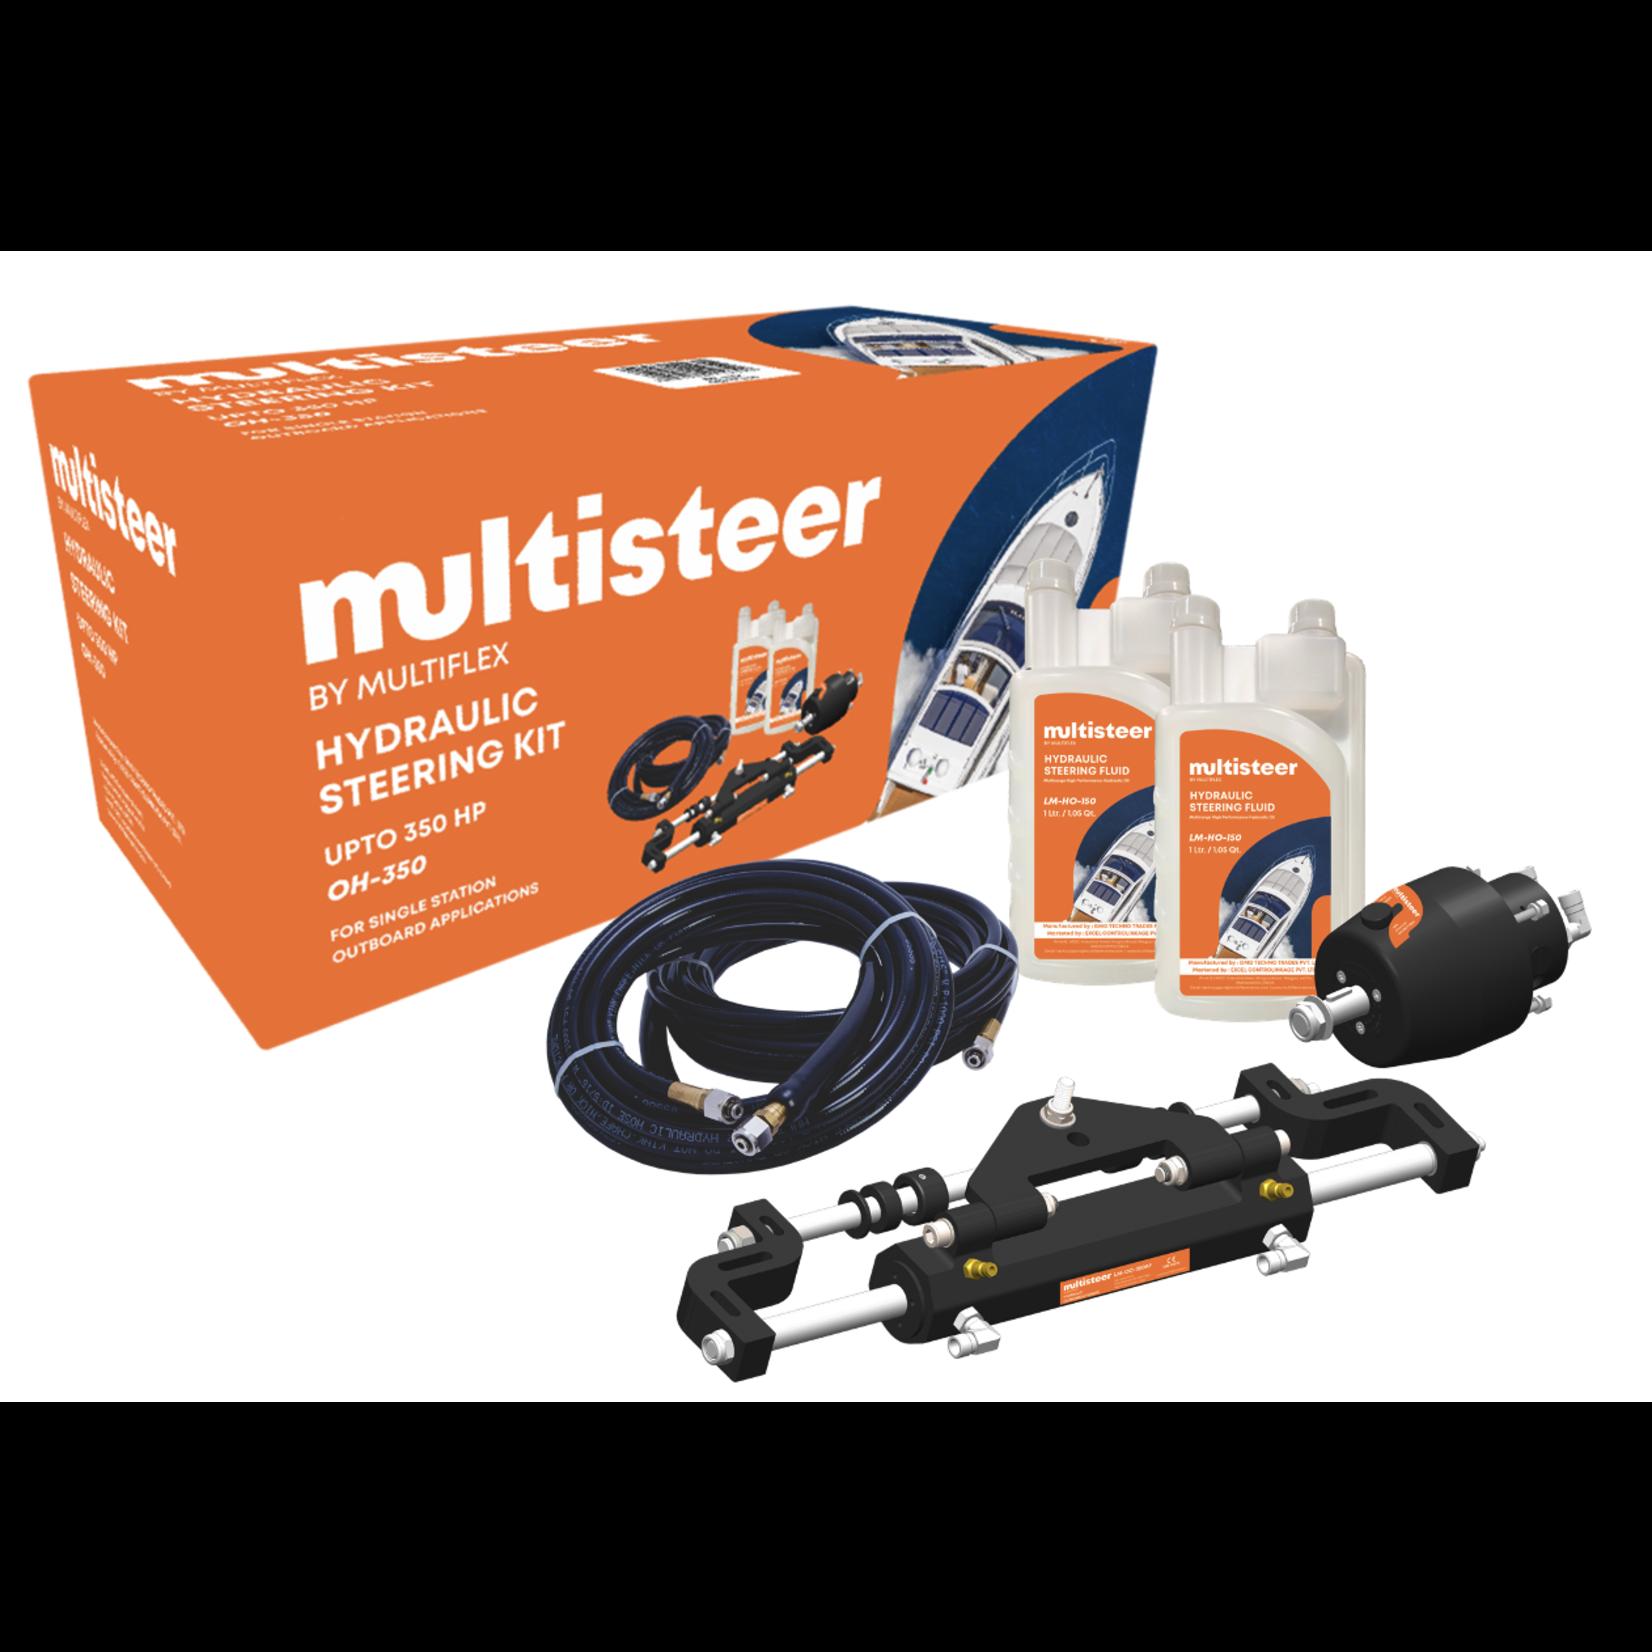 Multiflex Marine  Hydraulic Steering Kit - Single Outboard